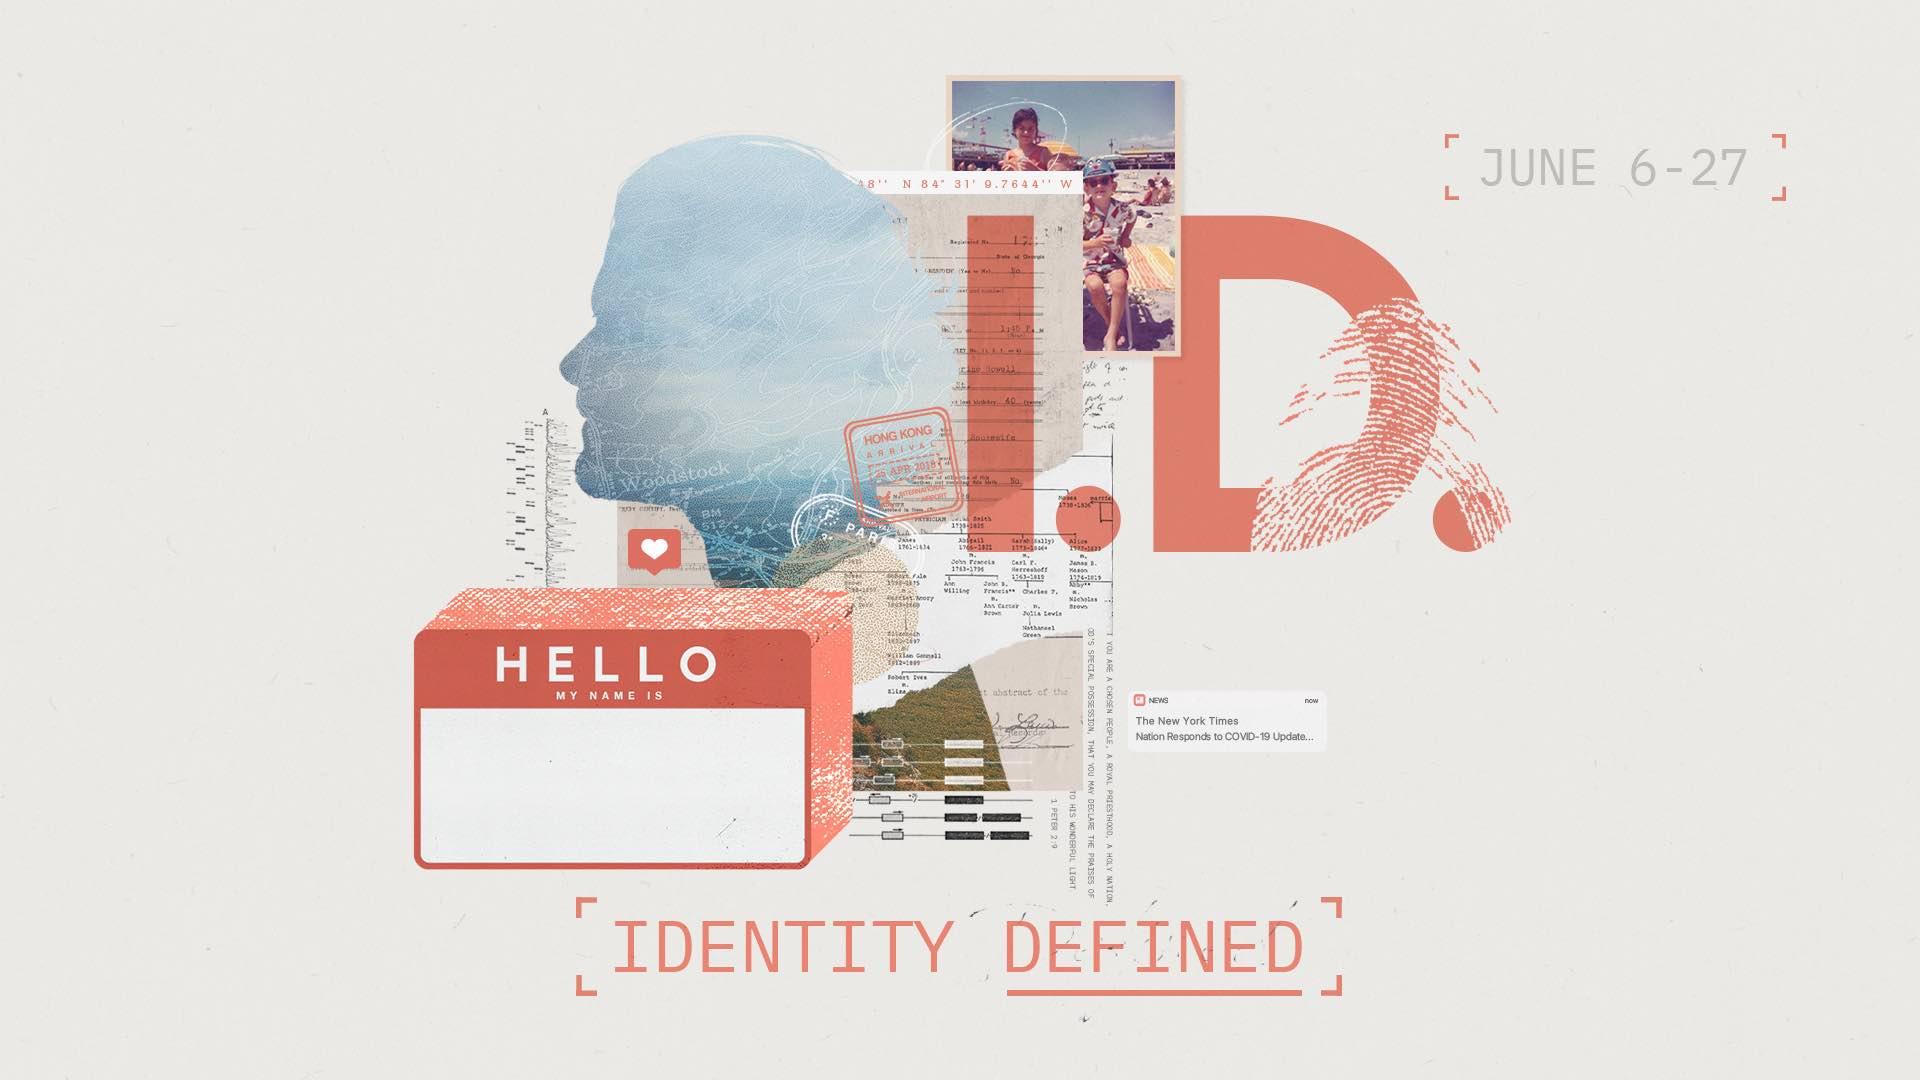 Identity Defined